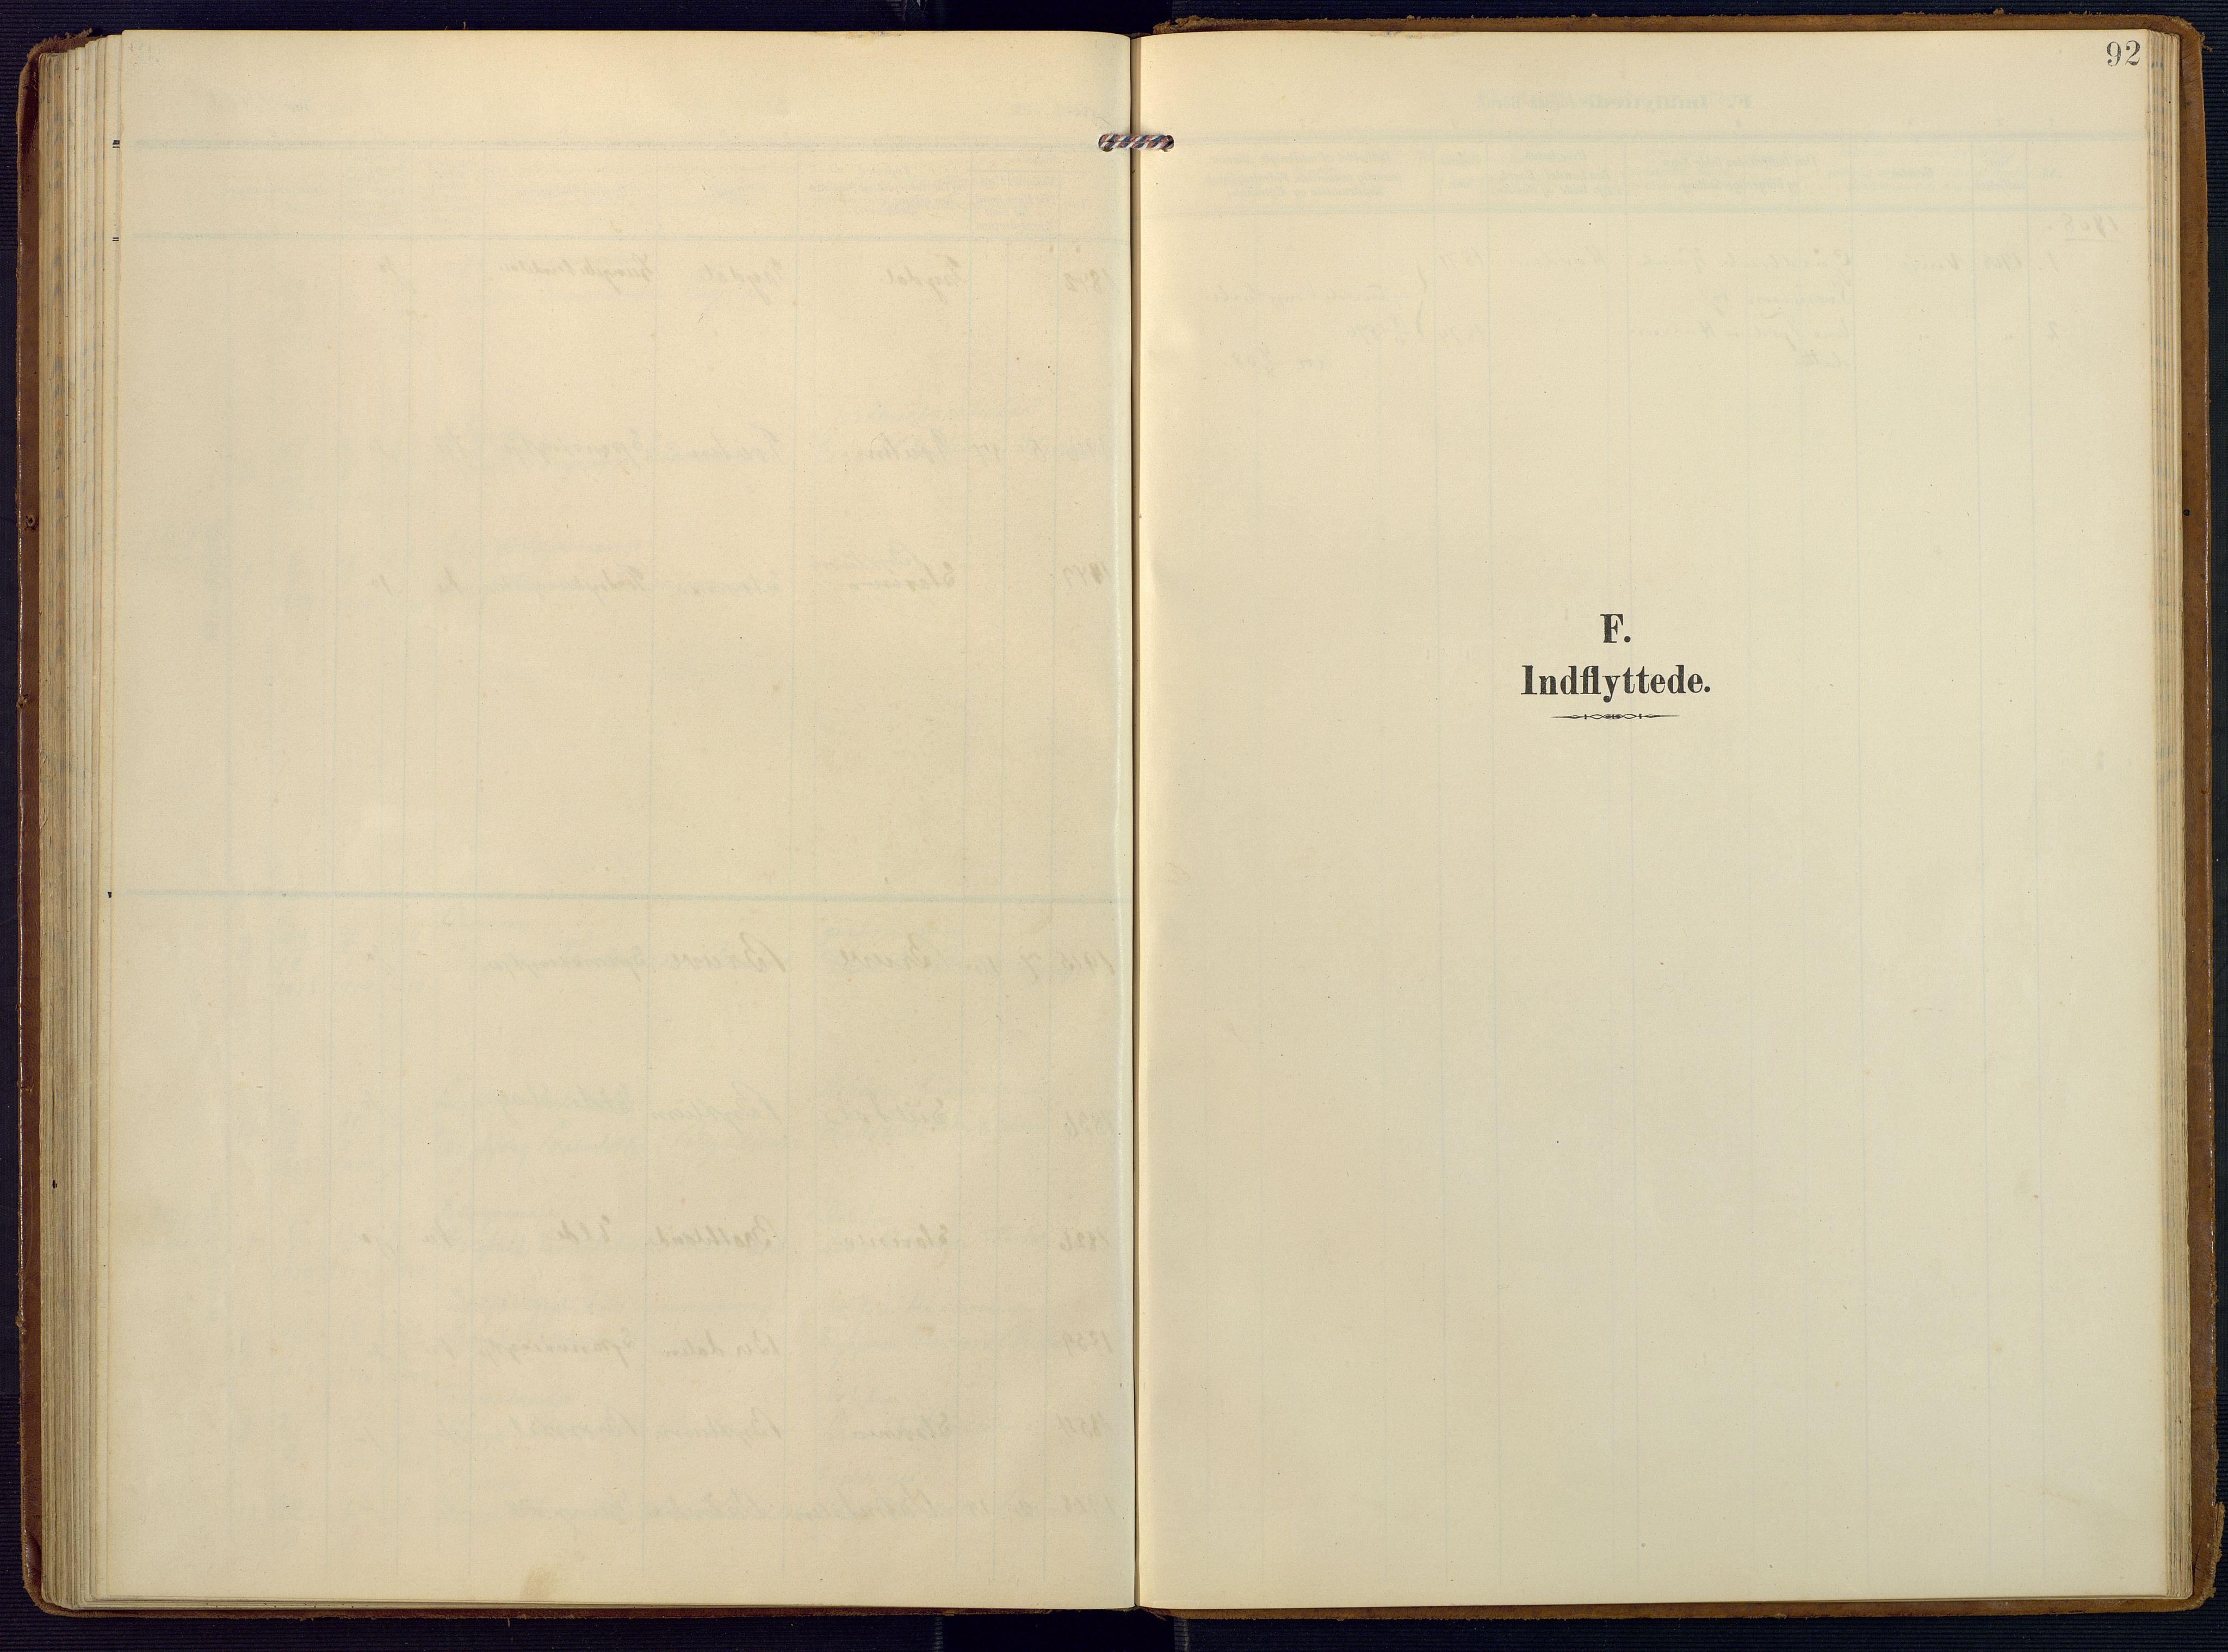 SAK, Valle sokneprestkontor, F/Fa/Faa/L0002: Ministerialbok nr. A 2, 1907-1919, s. 92